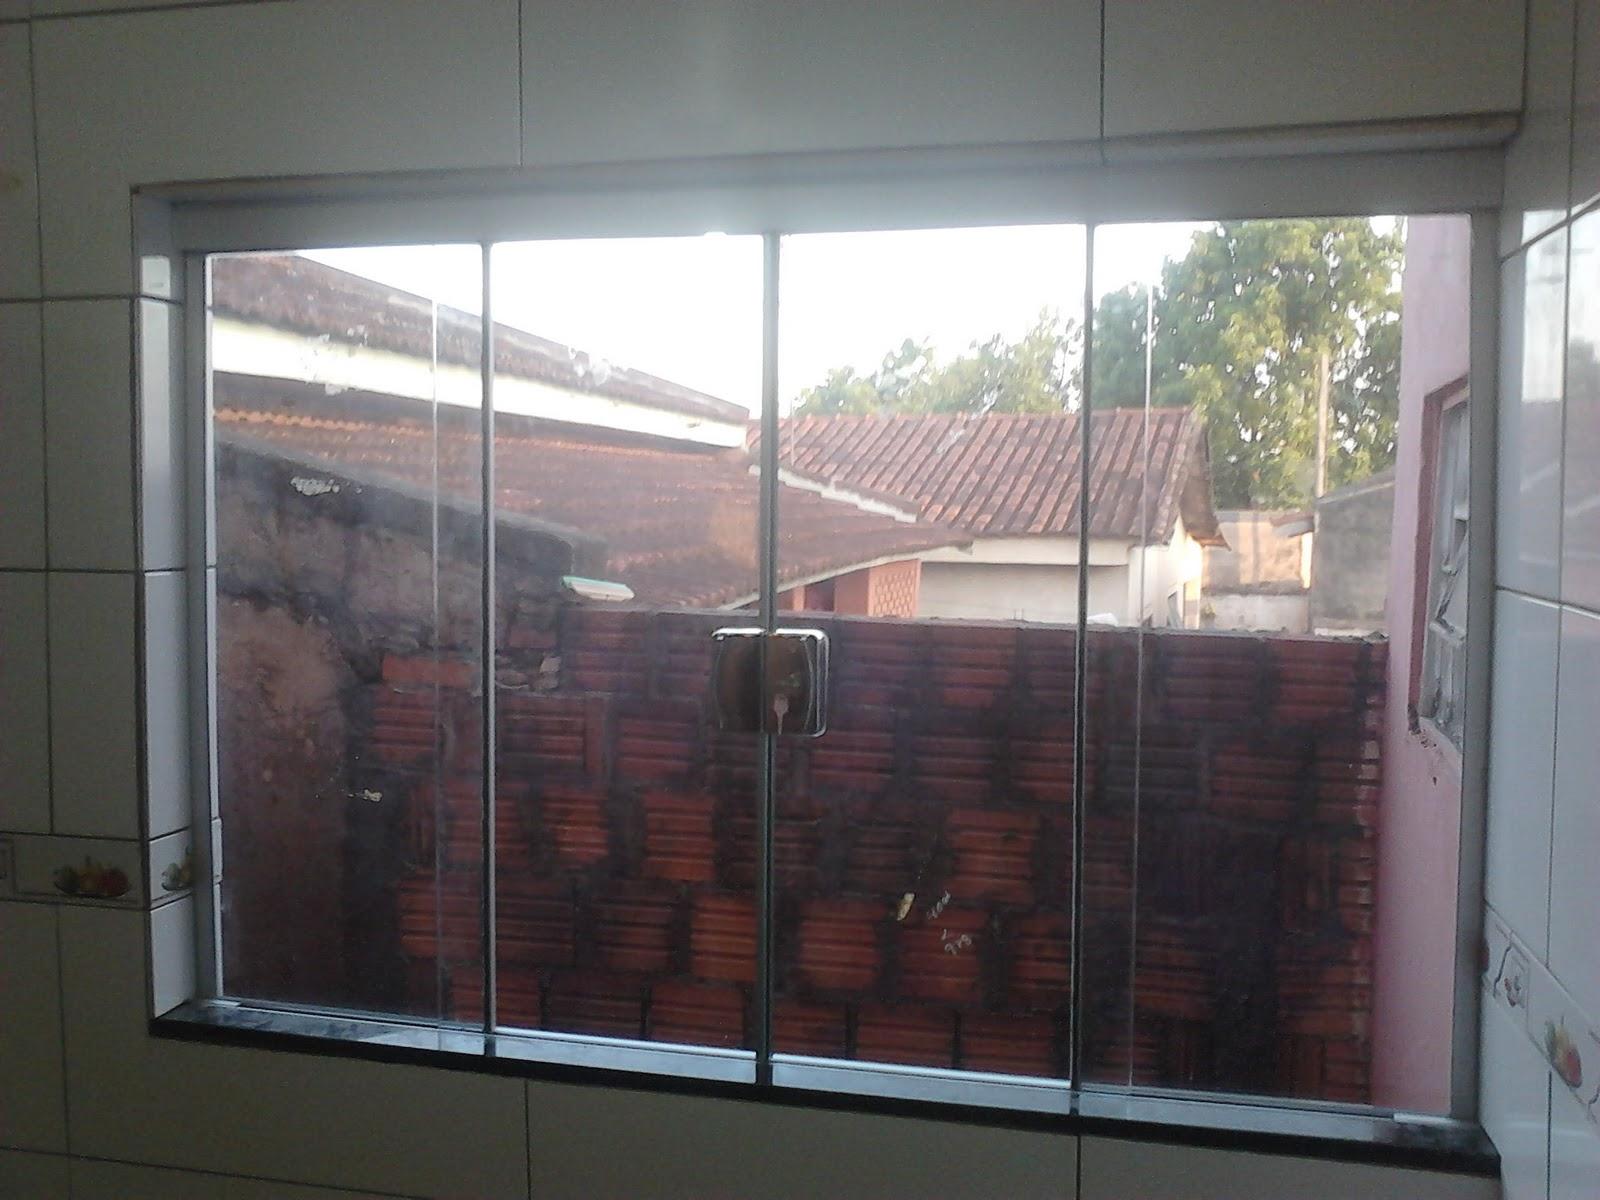 #7C714F Janelas de 1 00x2 00 e 1 00x1 50 ambas de 04 folhas no vidro incolor  200 Janelas De Vidro No Abc